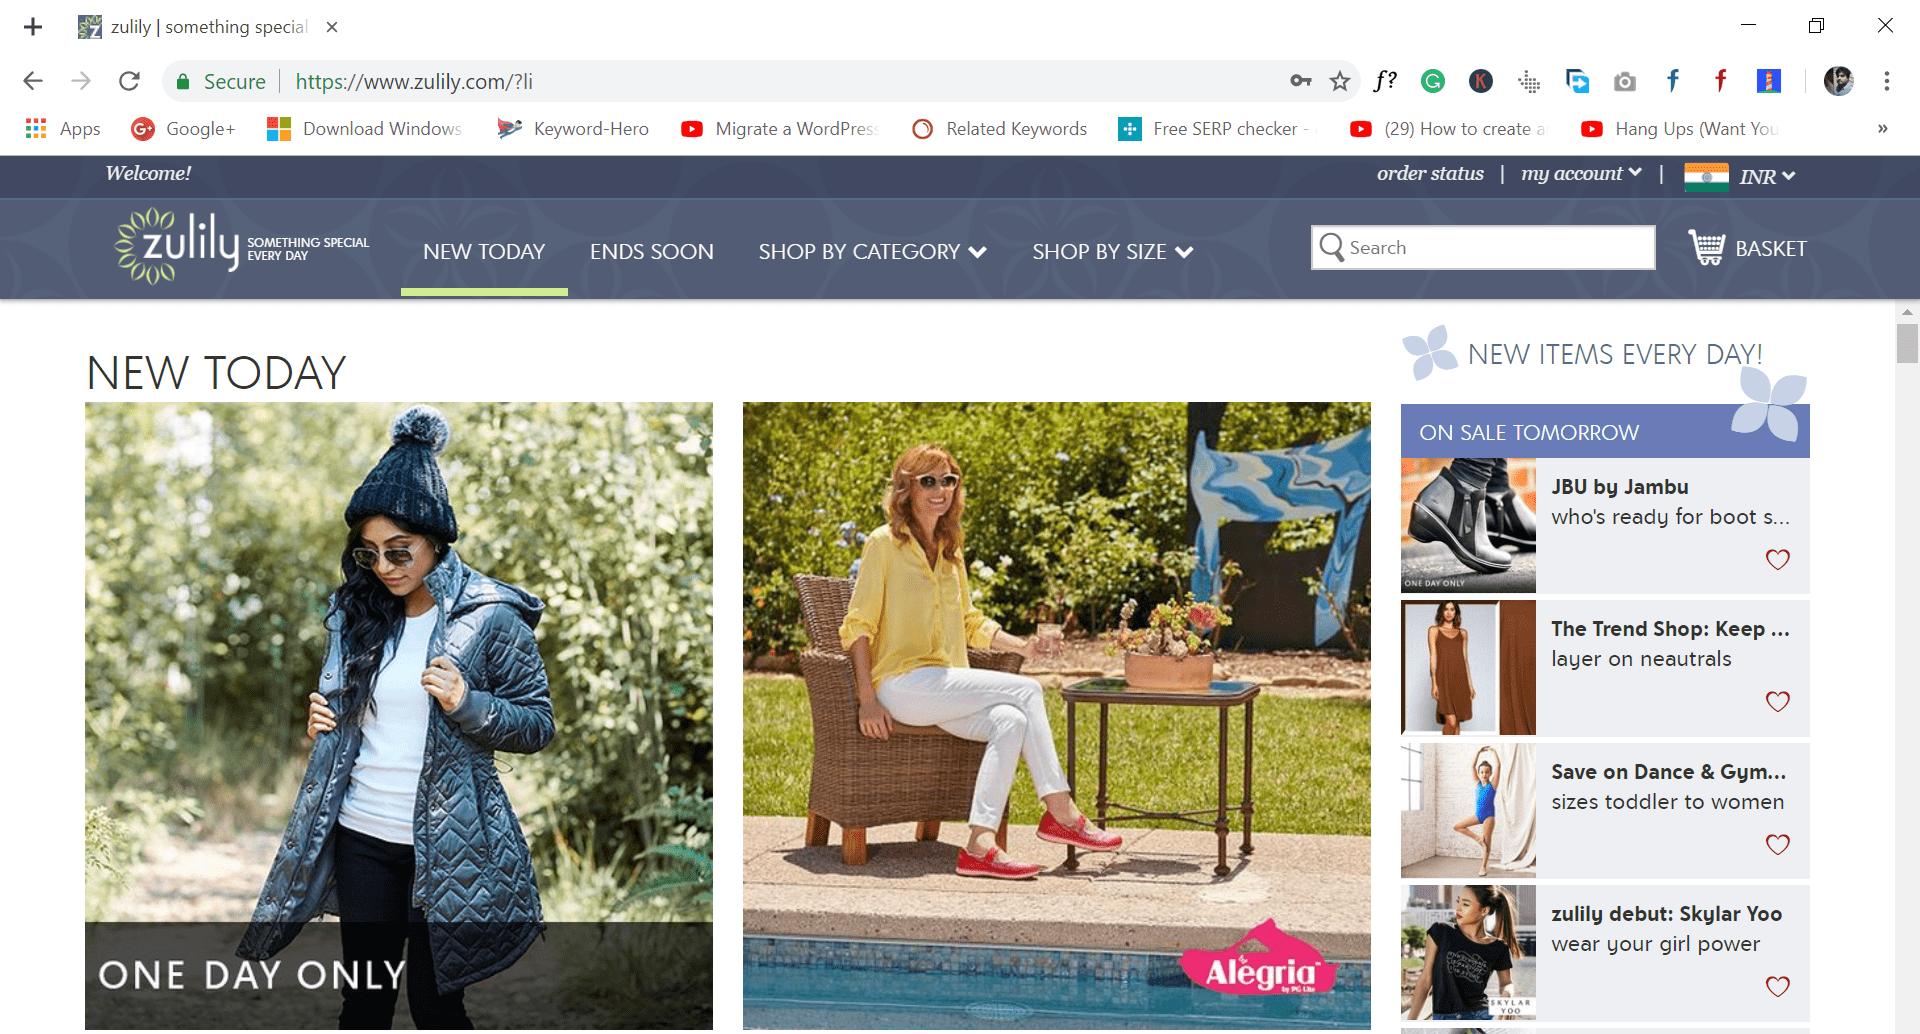 zulily - site like wish.com